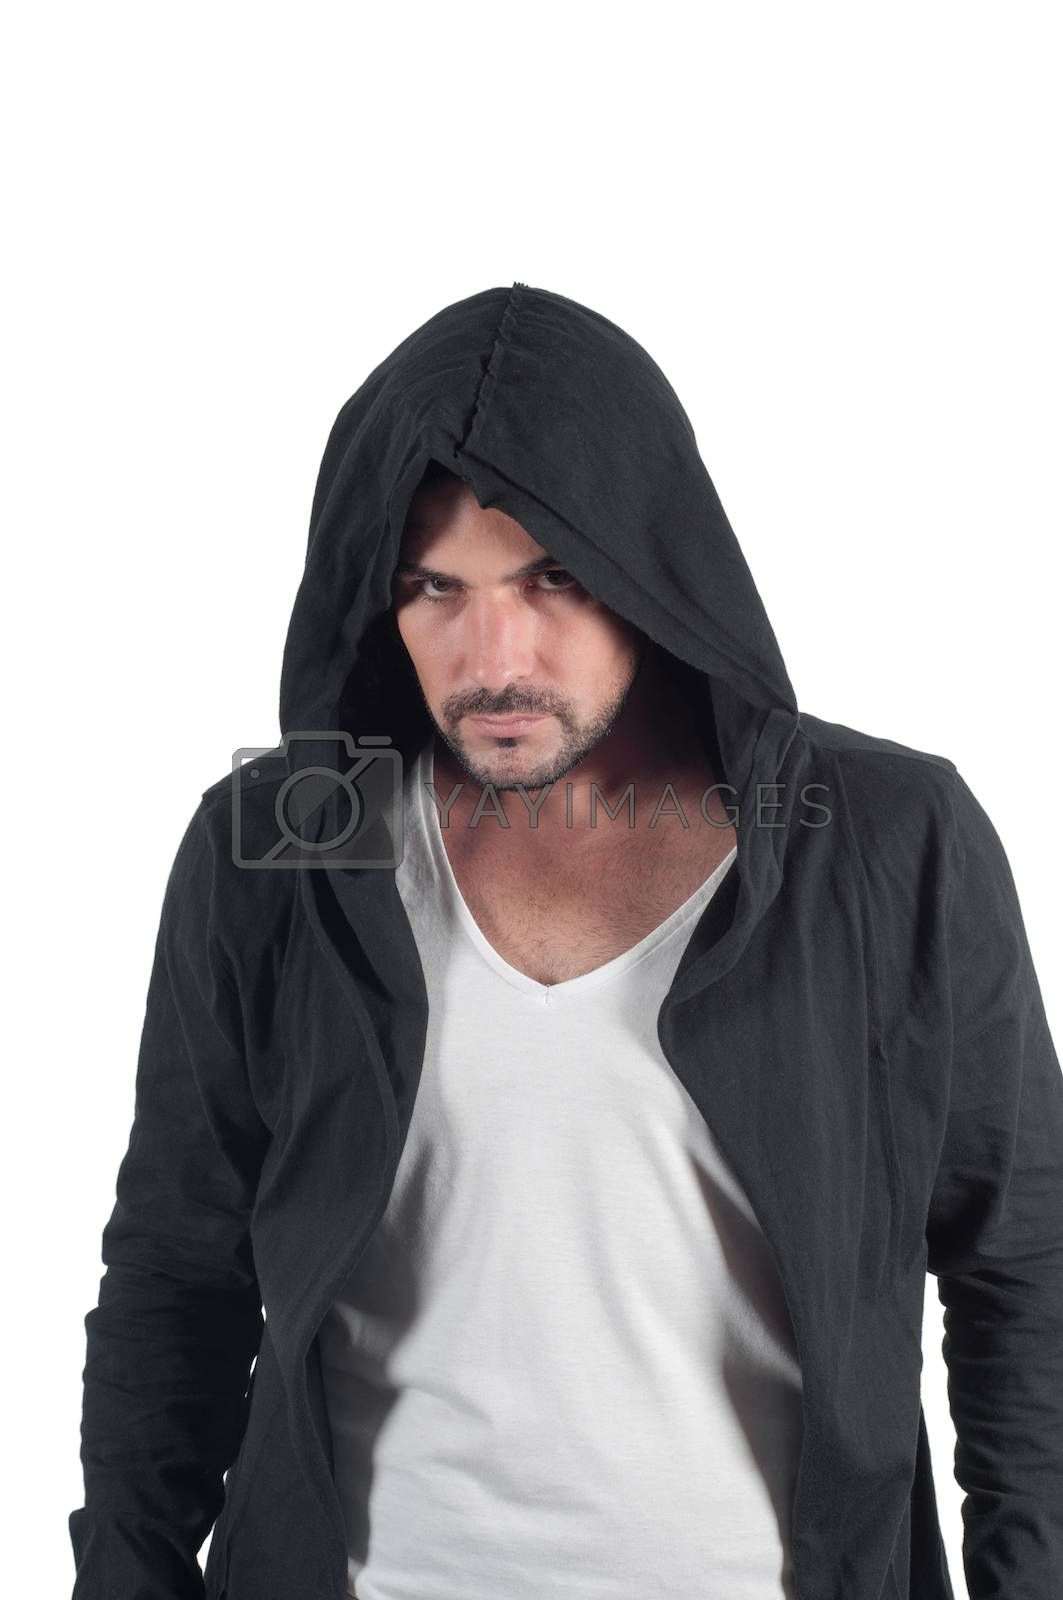 A male in a hood looks askance menacingly